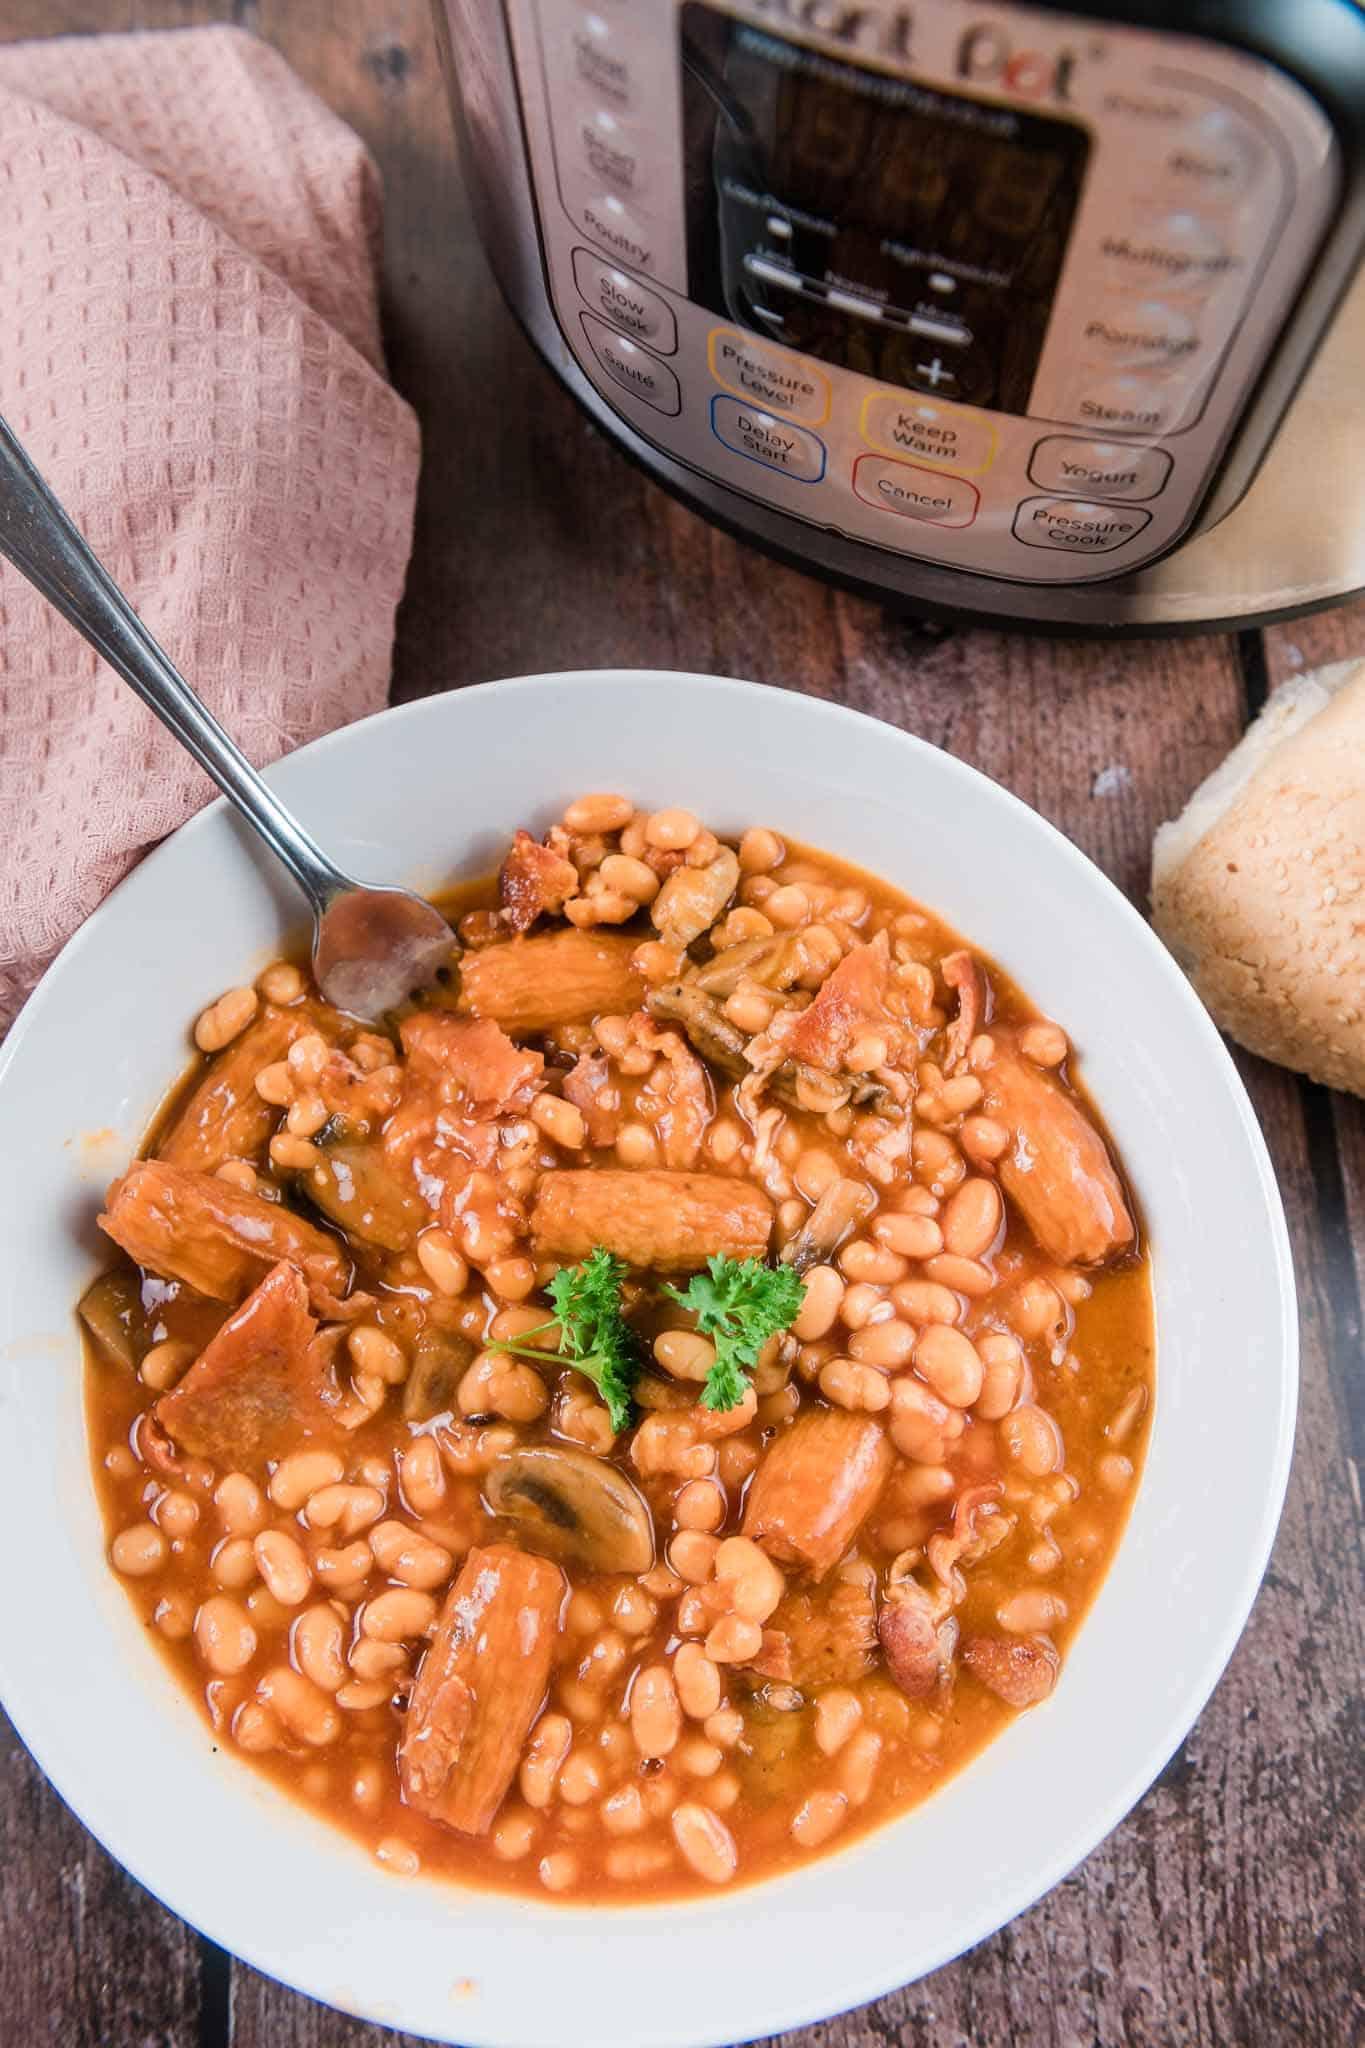 instant pot cowboy casserole ingredients in bowls